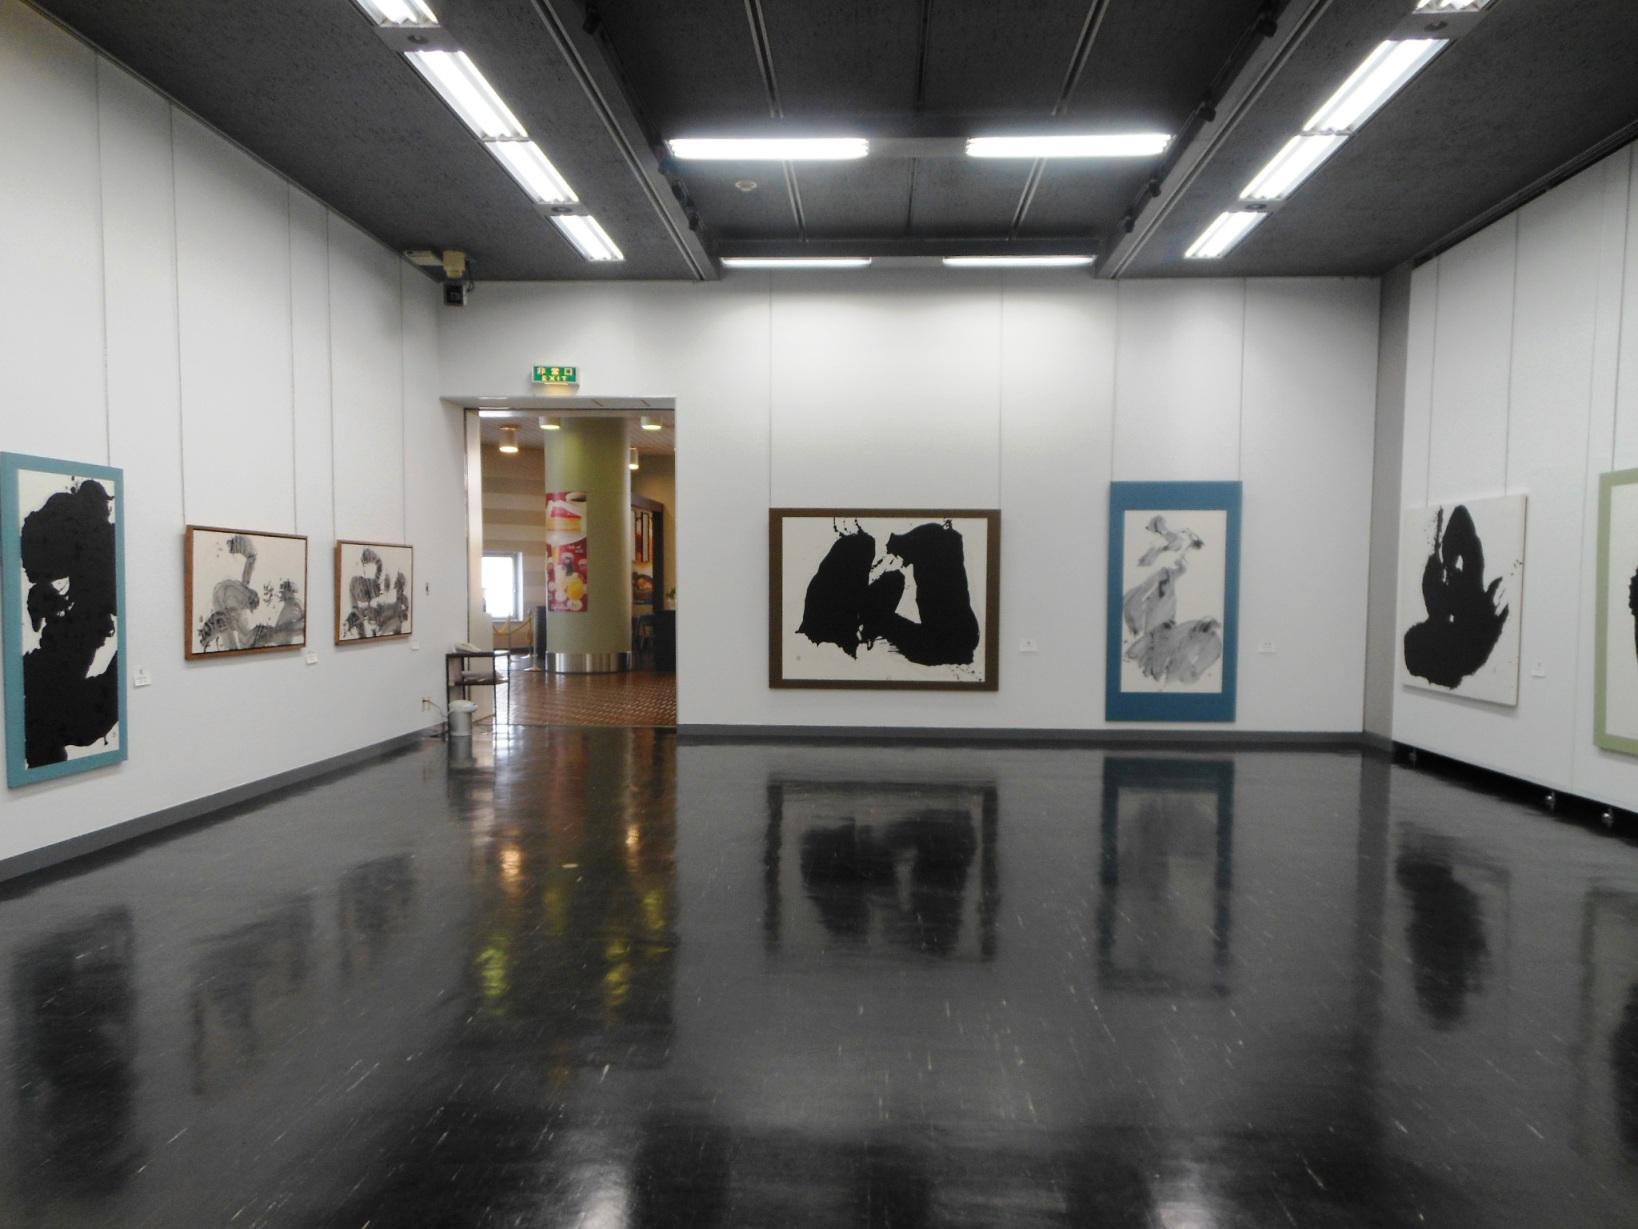 1690)「第26回 北海道墨人展」 市民ギャラリー 4月4日(水)~4月8日(日) _f0126829_1572780.jpg